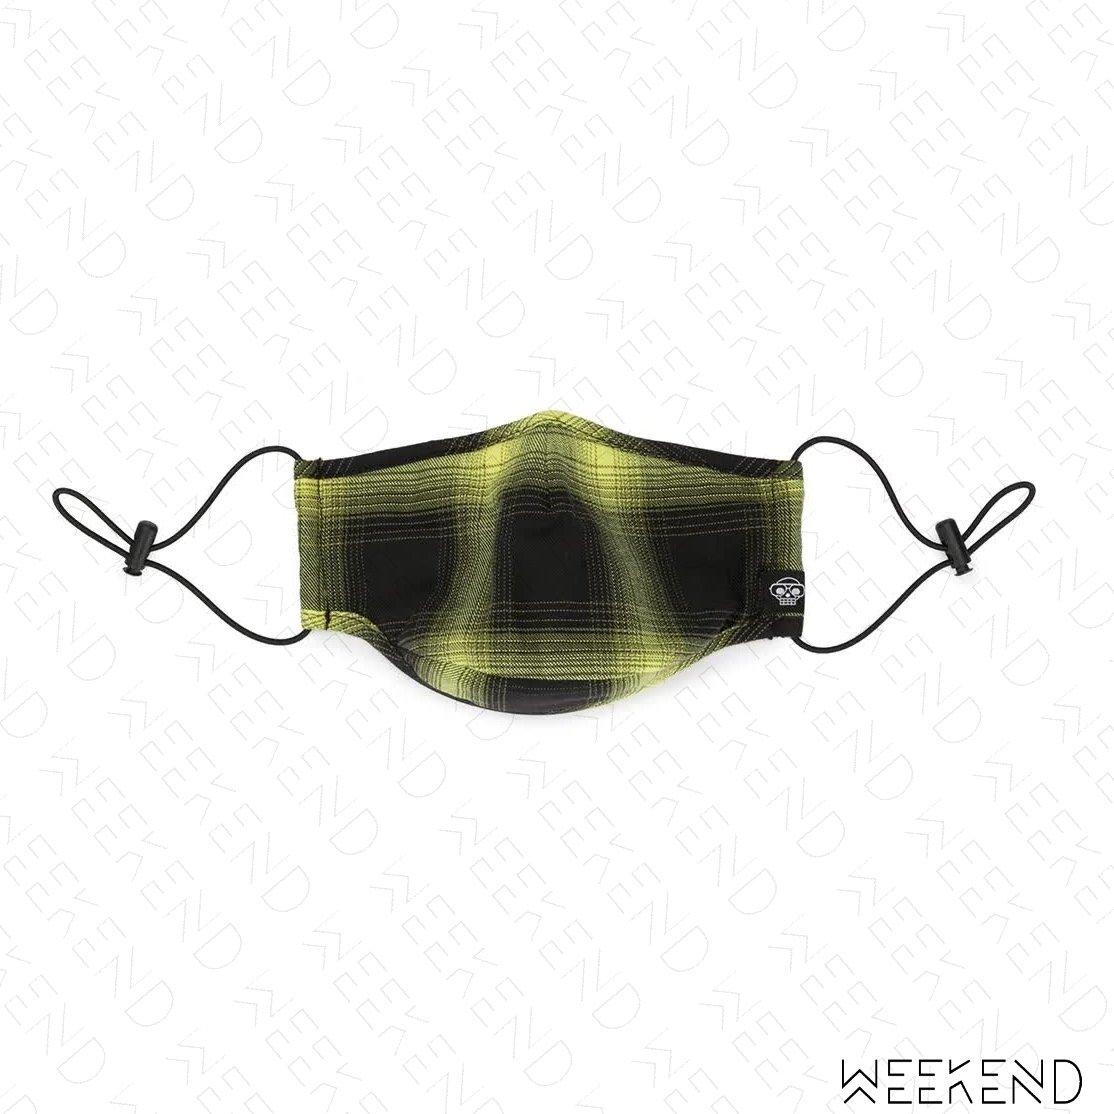 【WEEKEND】 MOSTLT HEARD RARELY SEEN MHRS 格紋 可調式束帶 口罩 黃黑色